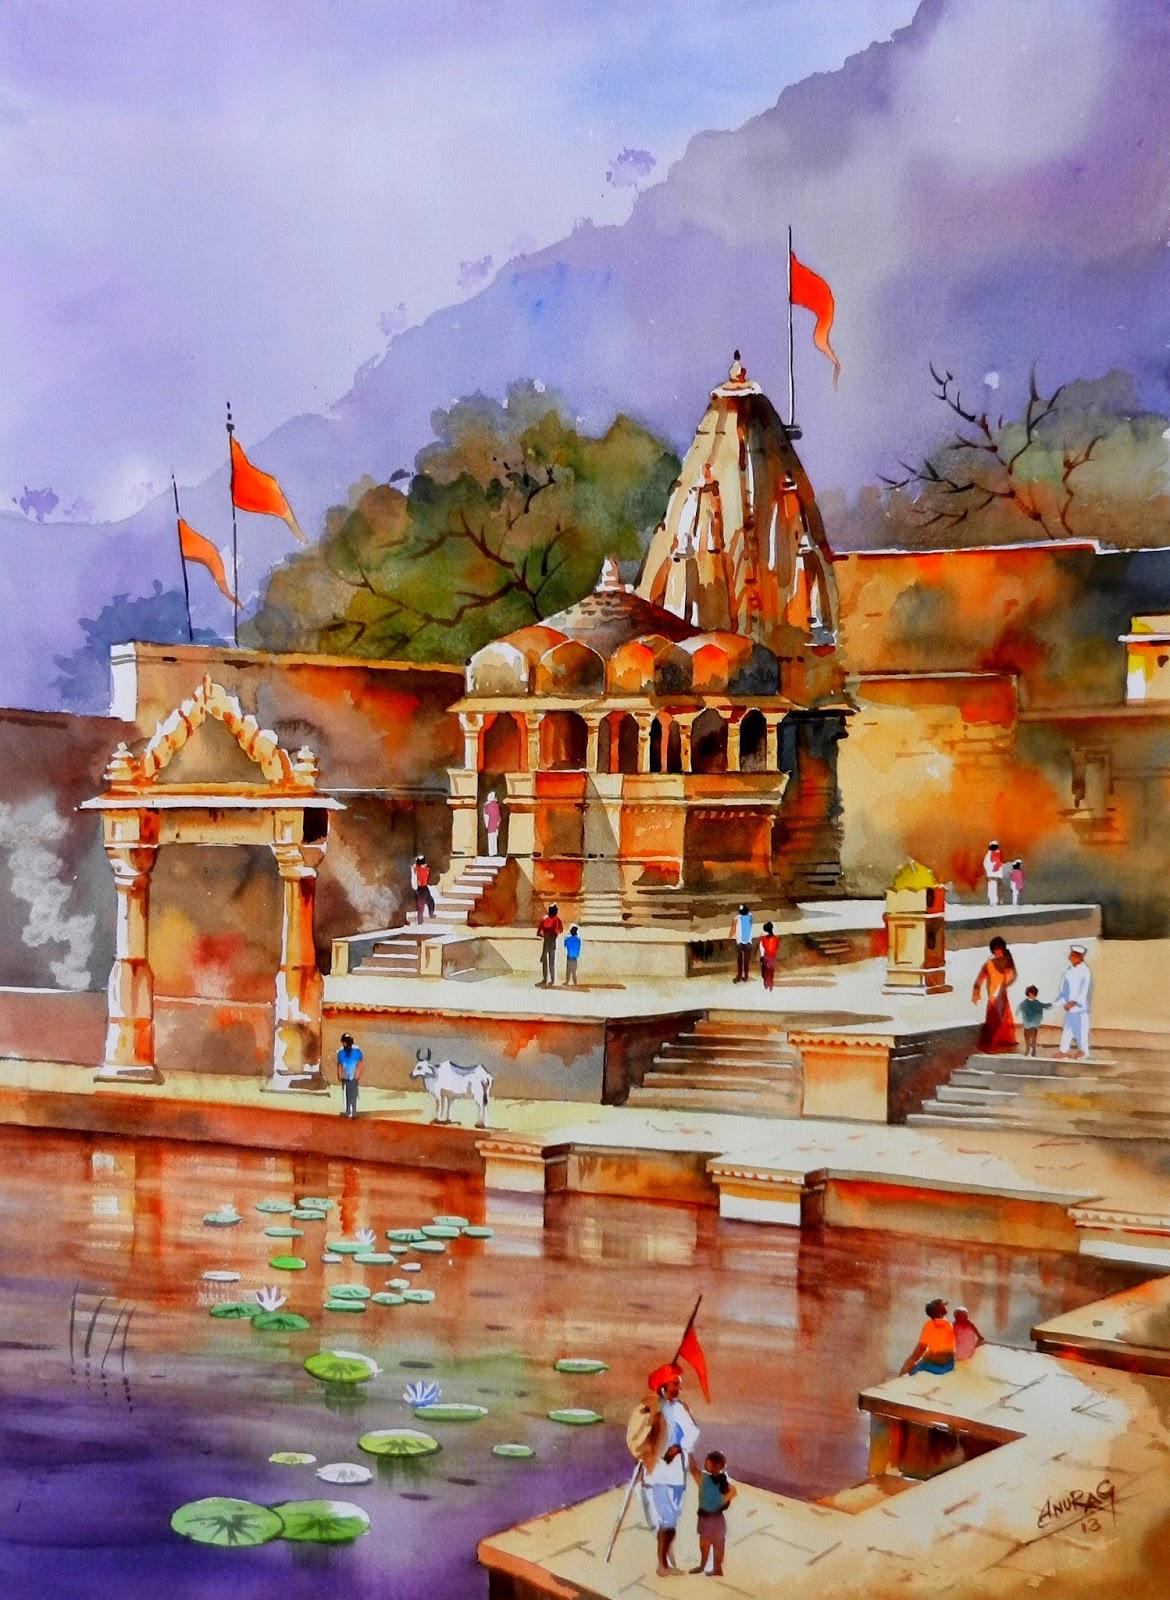 Lord Shiva Watercolour Painting by saintvinod on DeviantArt